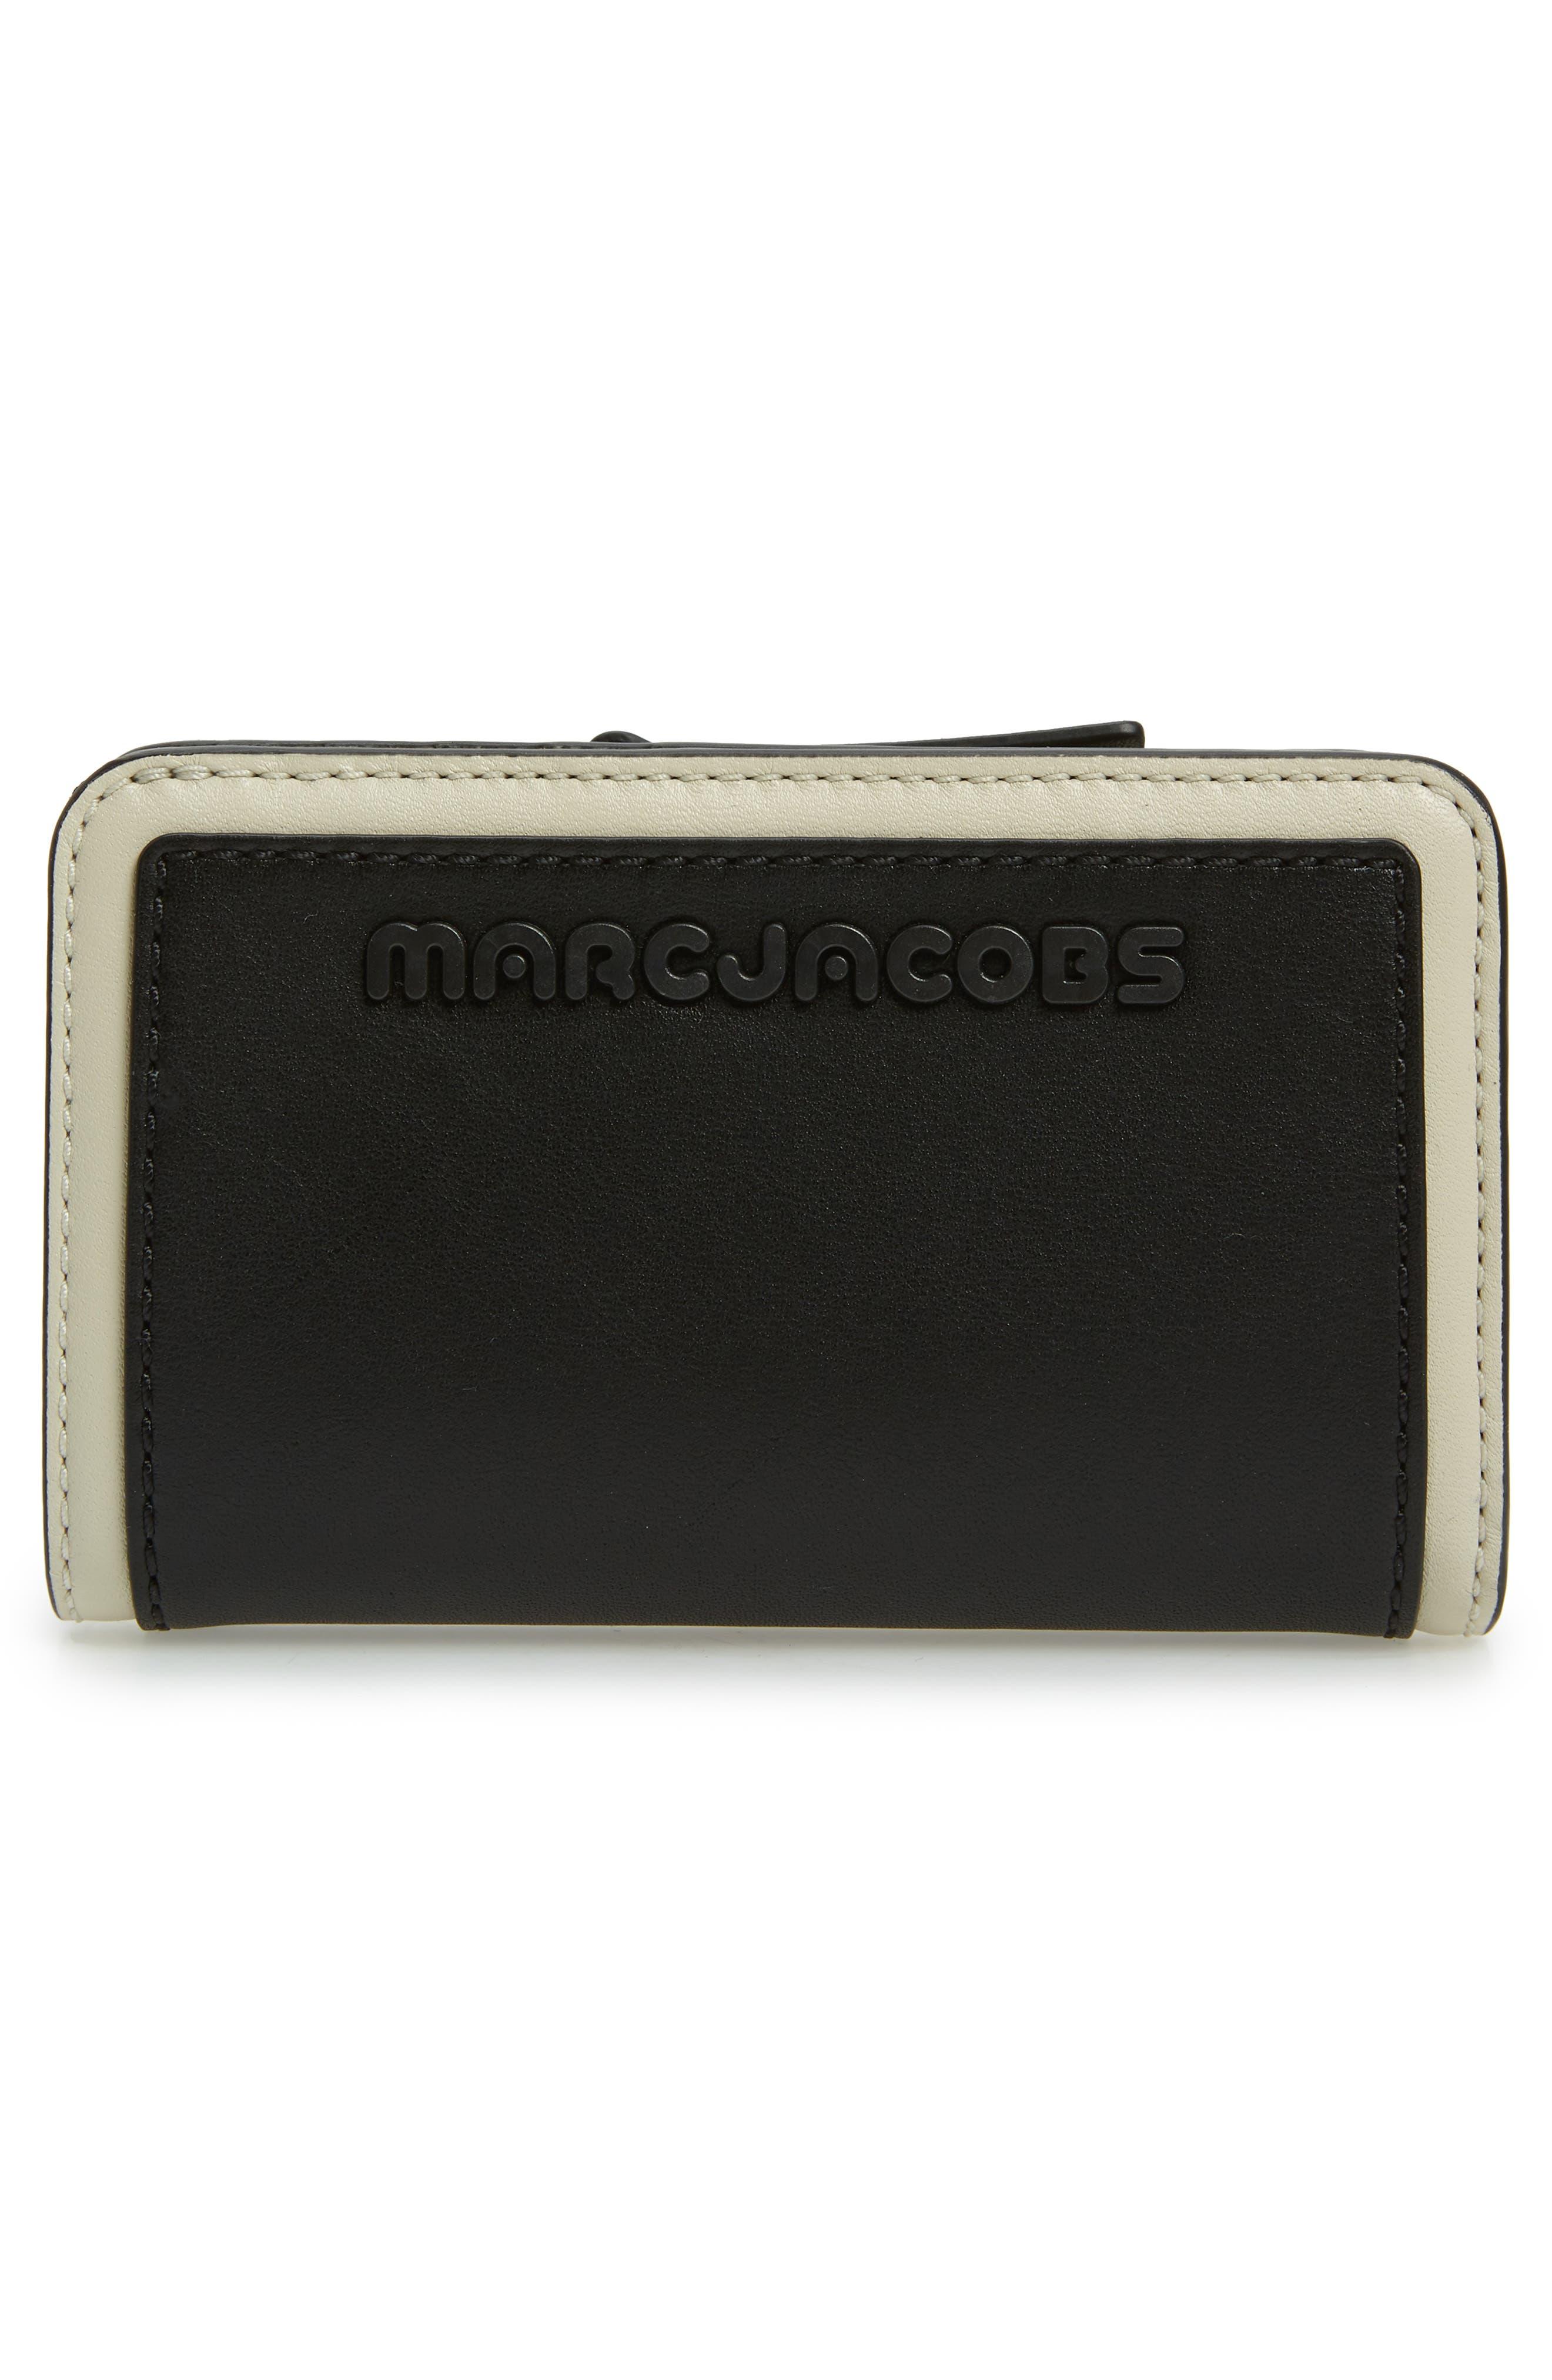 Sport Compact Leather Wallet,                             Alternate thumbnail 4, color,                             BLACK/ WHITE